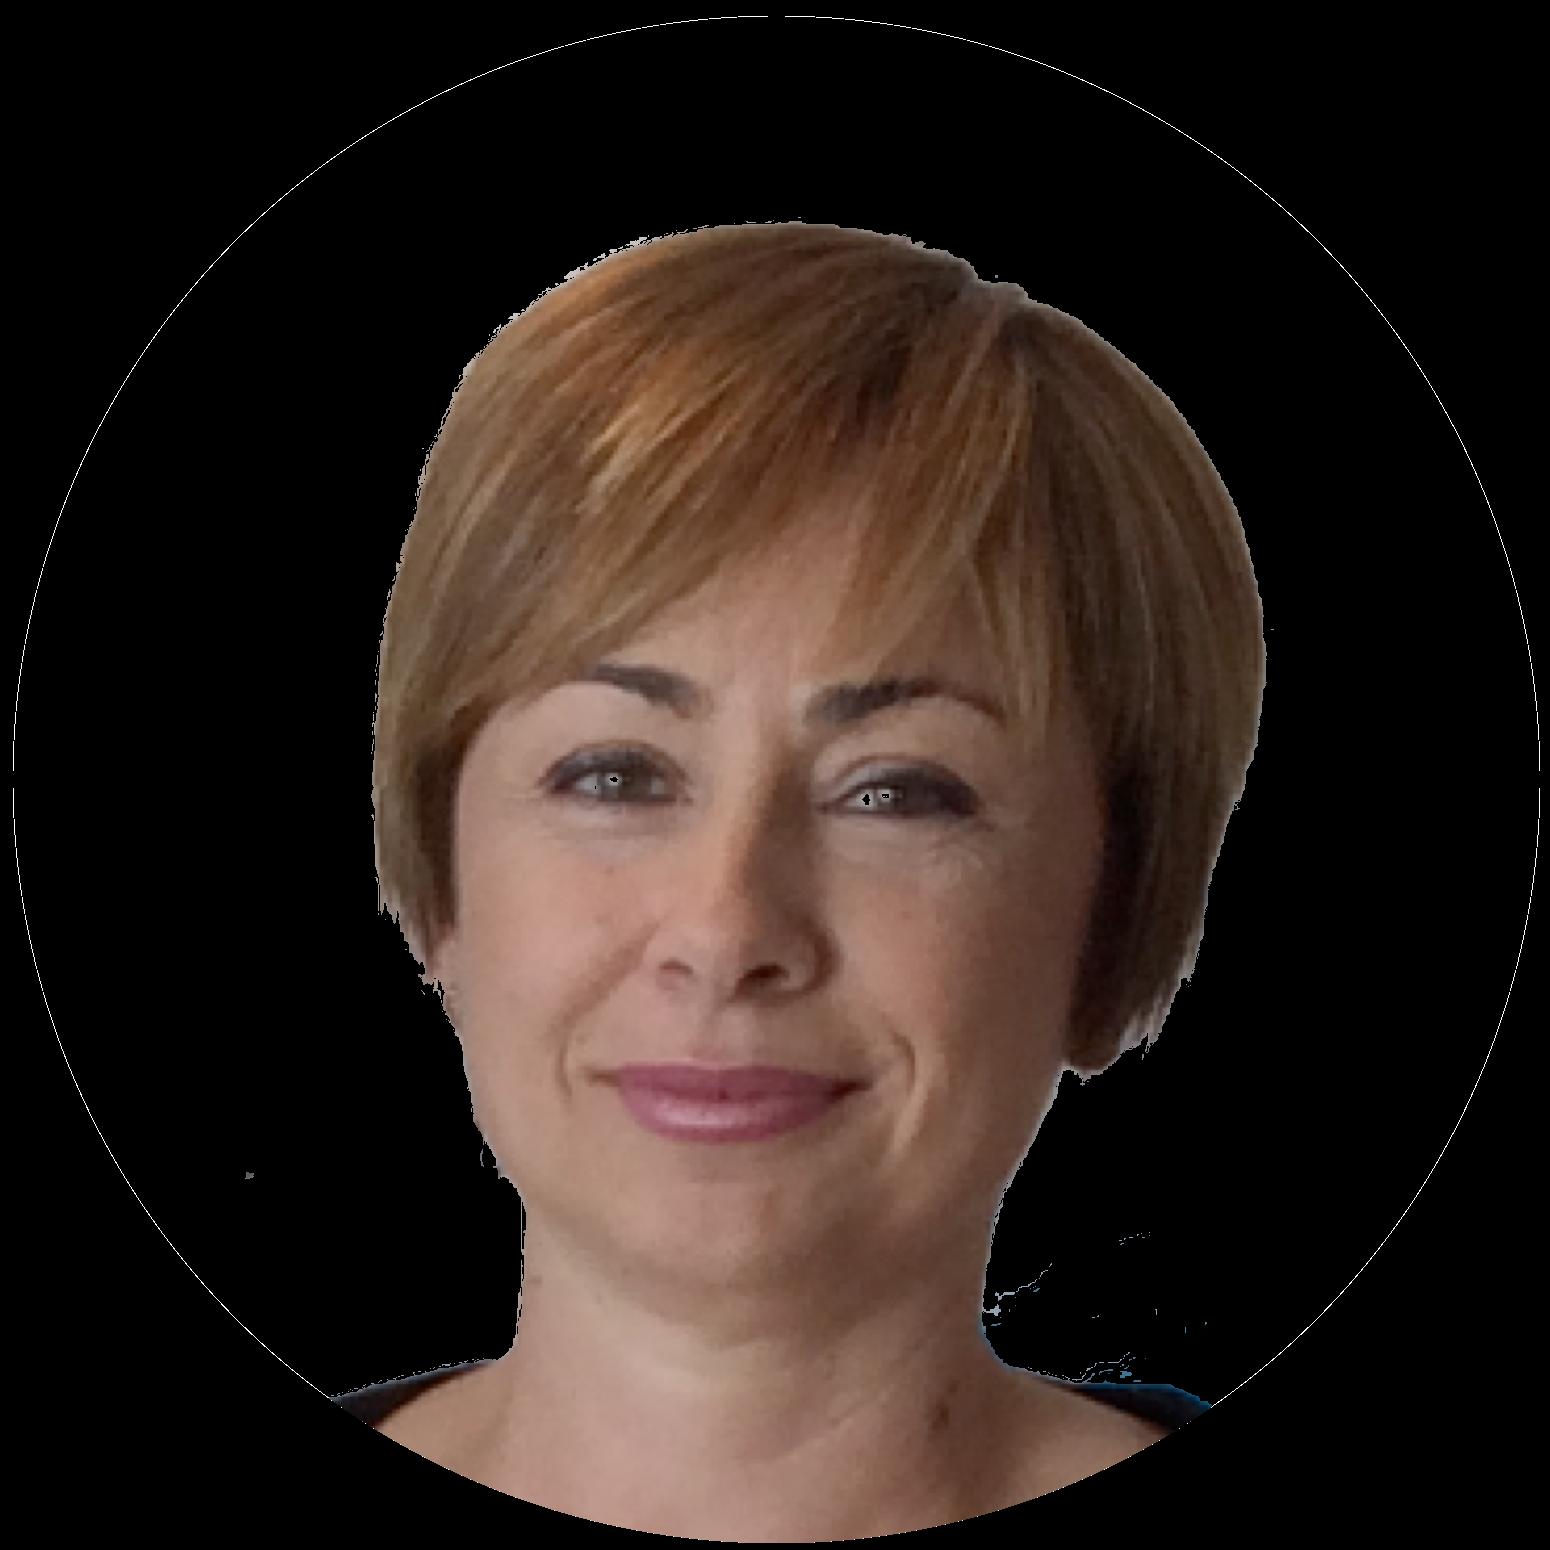 Rosa María Aguilar